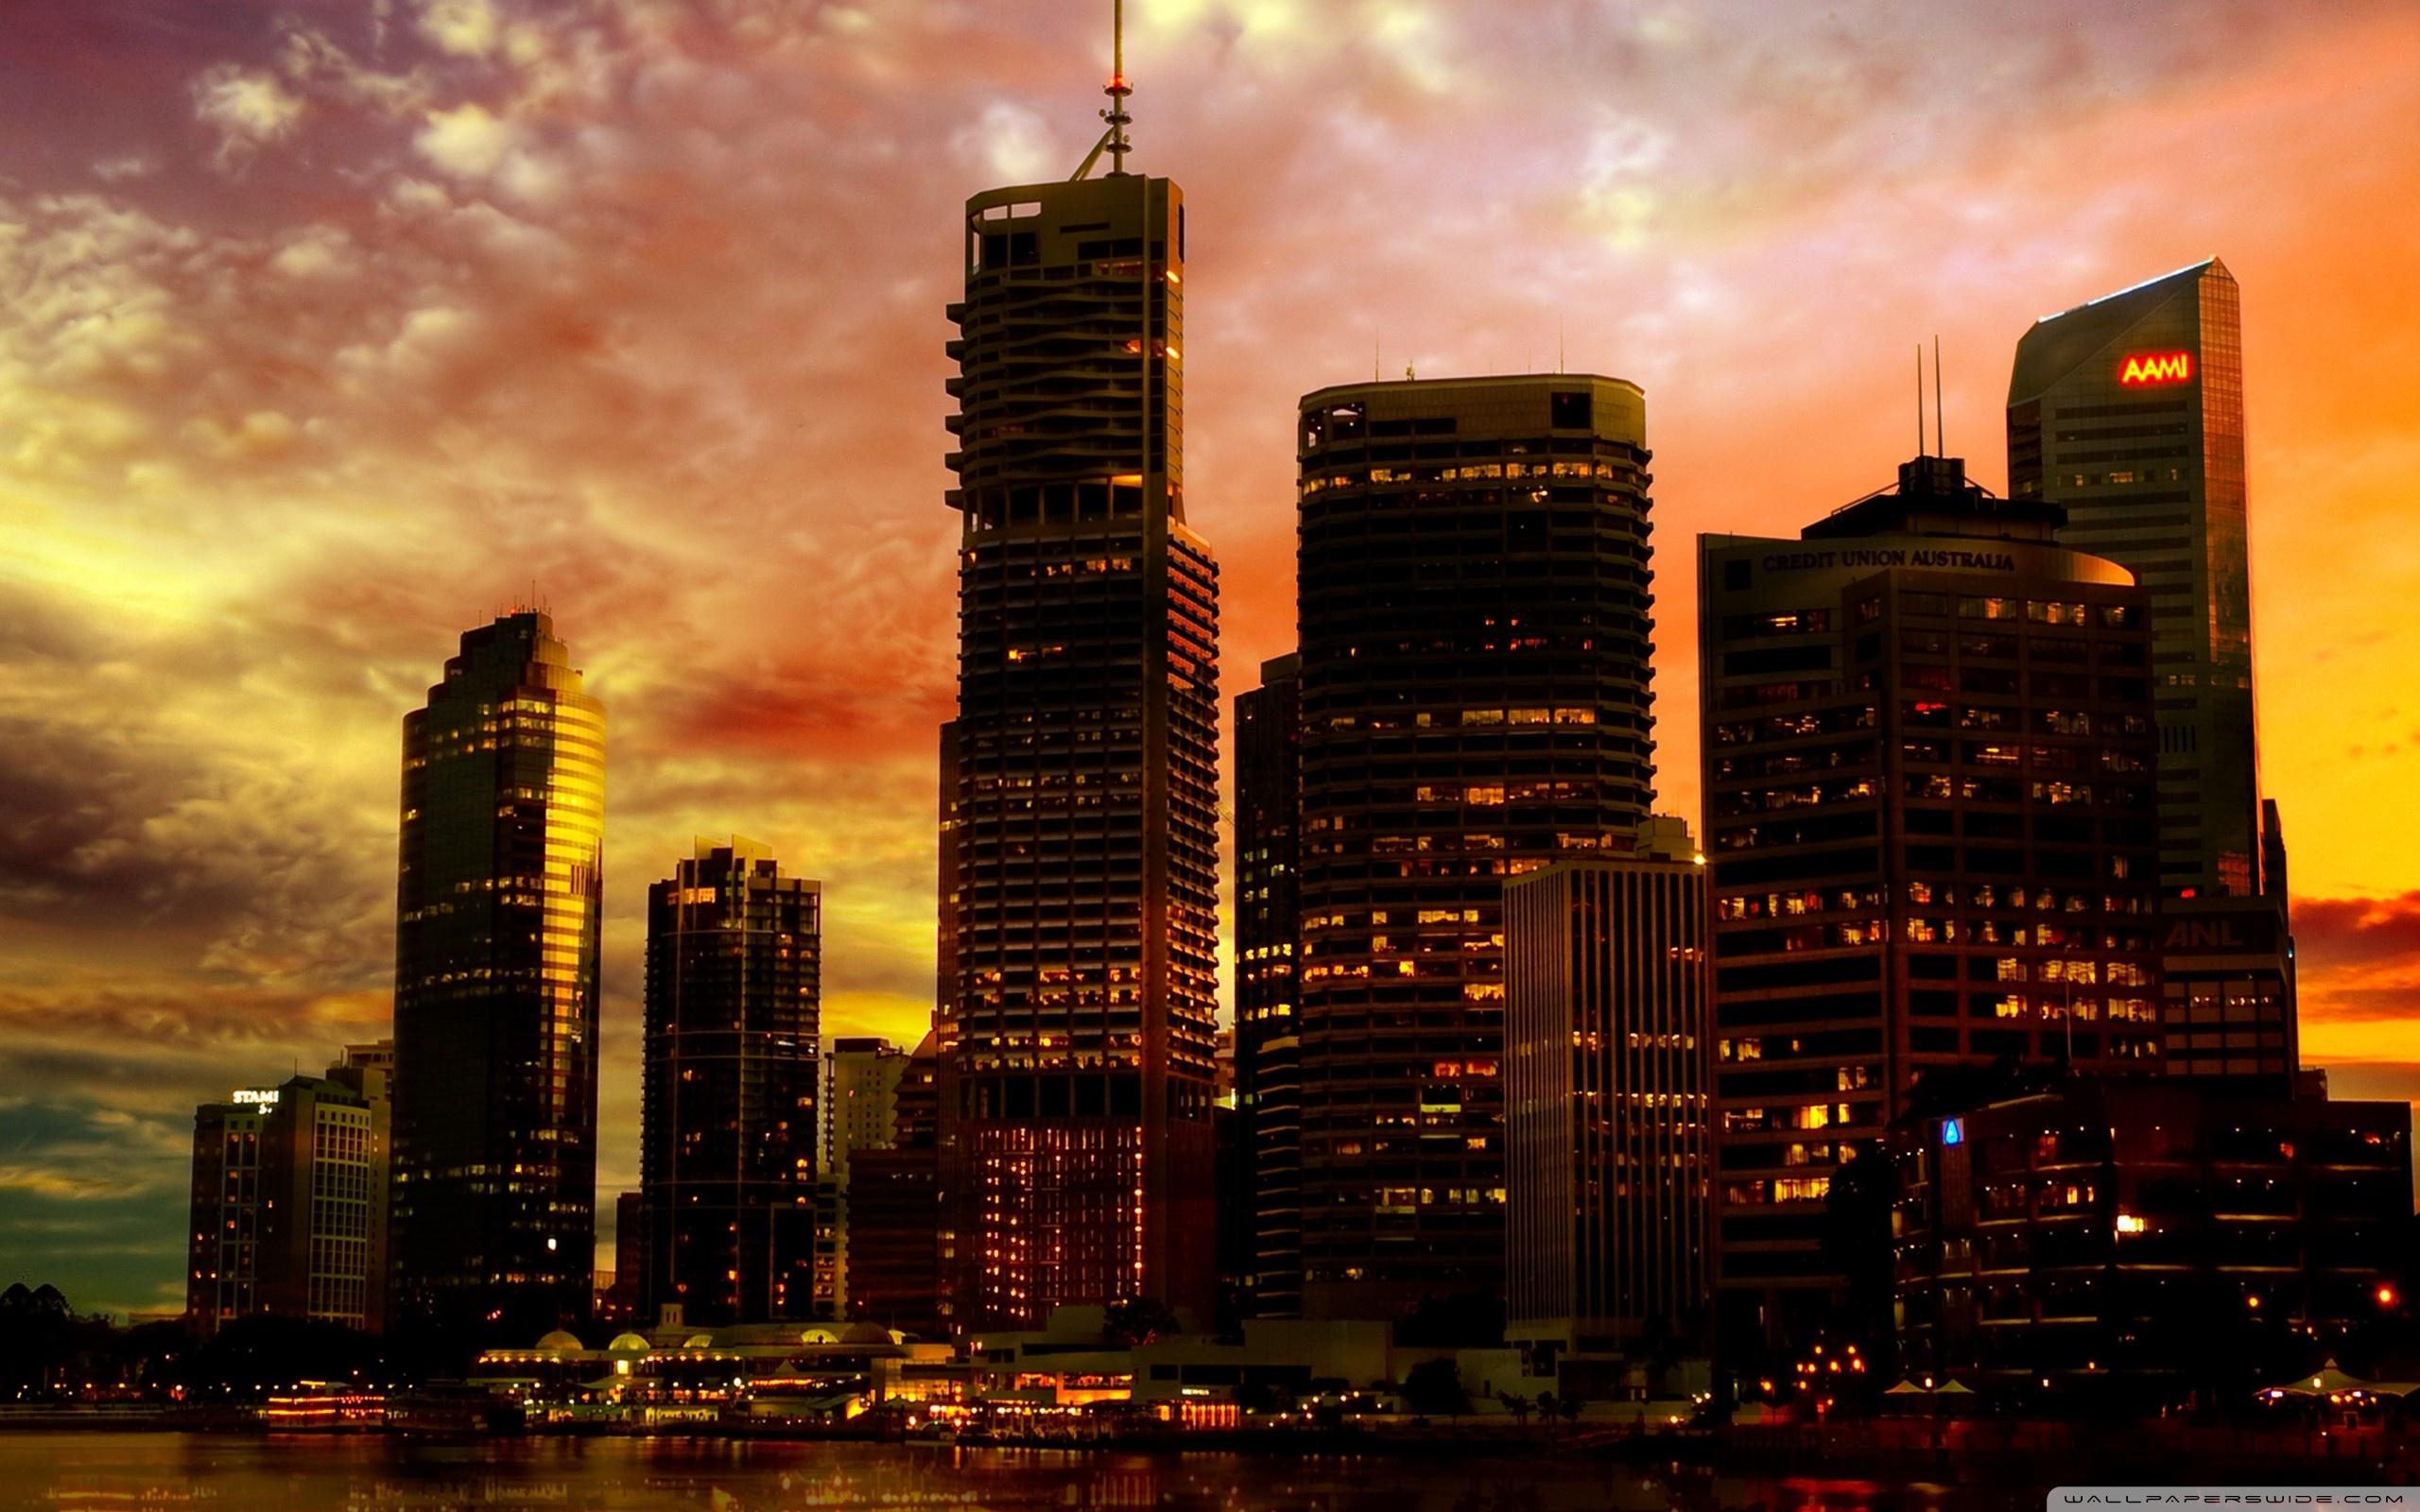 Australia City Wallpaper